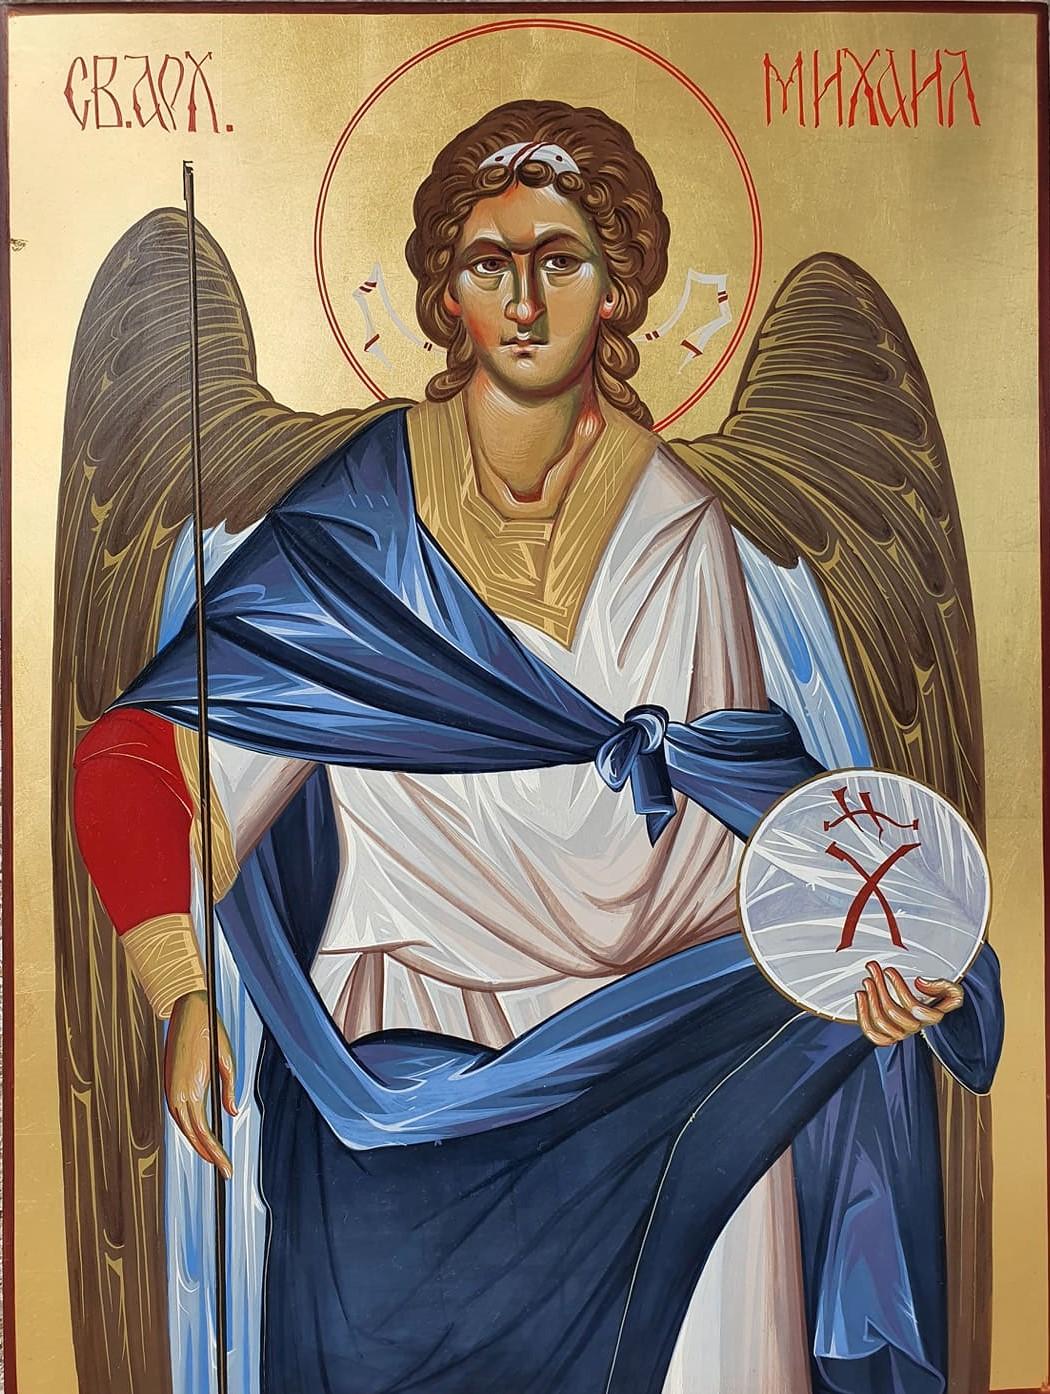 Sveti Arhangel Mihailo, ikona, 40×30 cm, jajcana tempera na medijapanu sa pozlatom, vizantijski stil po pravoslavnim kanonima, ikonopisac Nikola Timotijevic, sertifikat, 190 eura